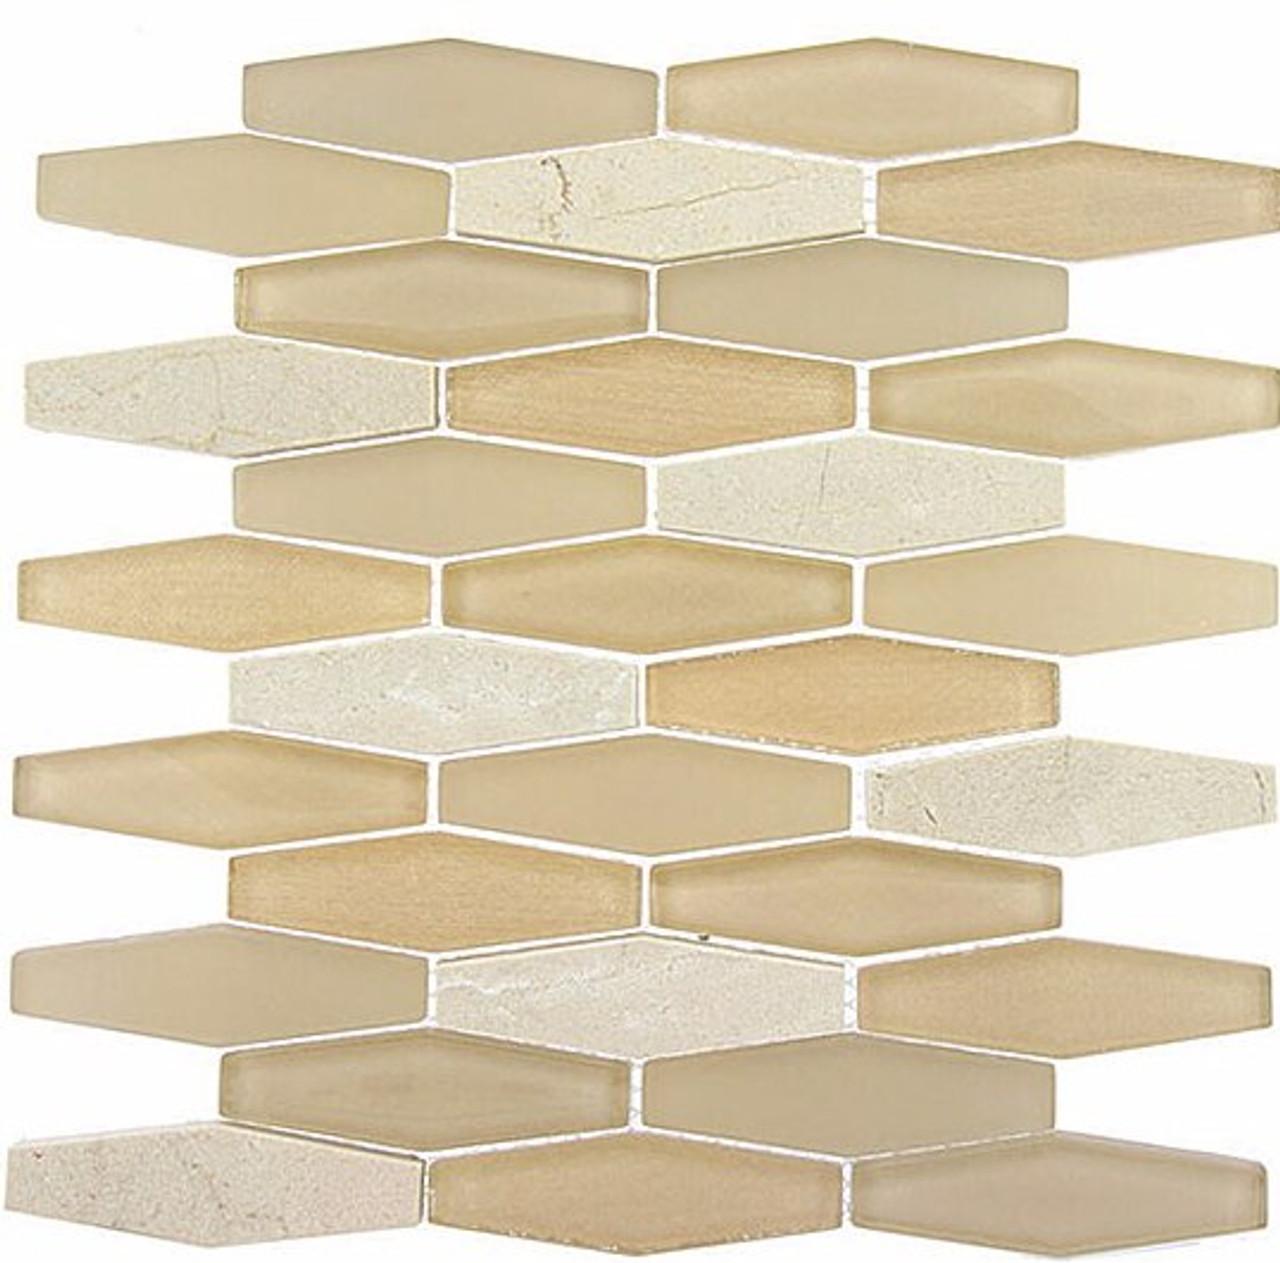 Bella Glass Tiles Astro Series Agave Specks STR-192